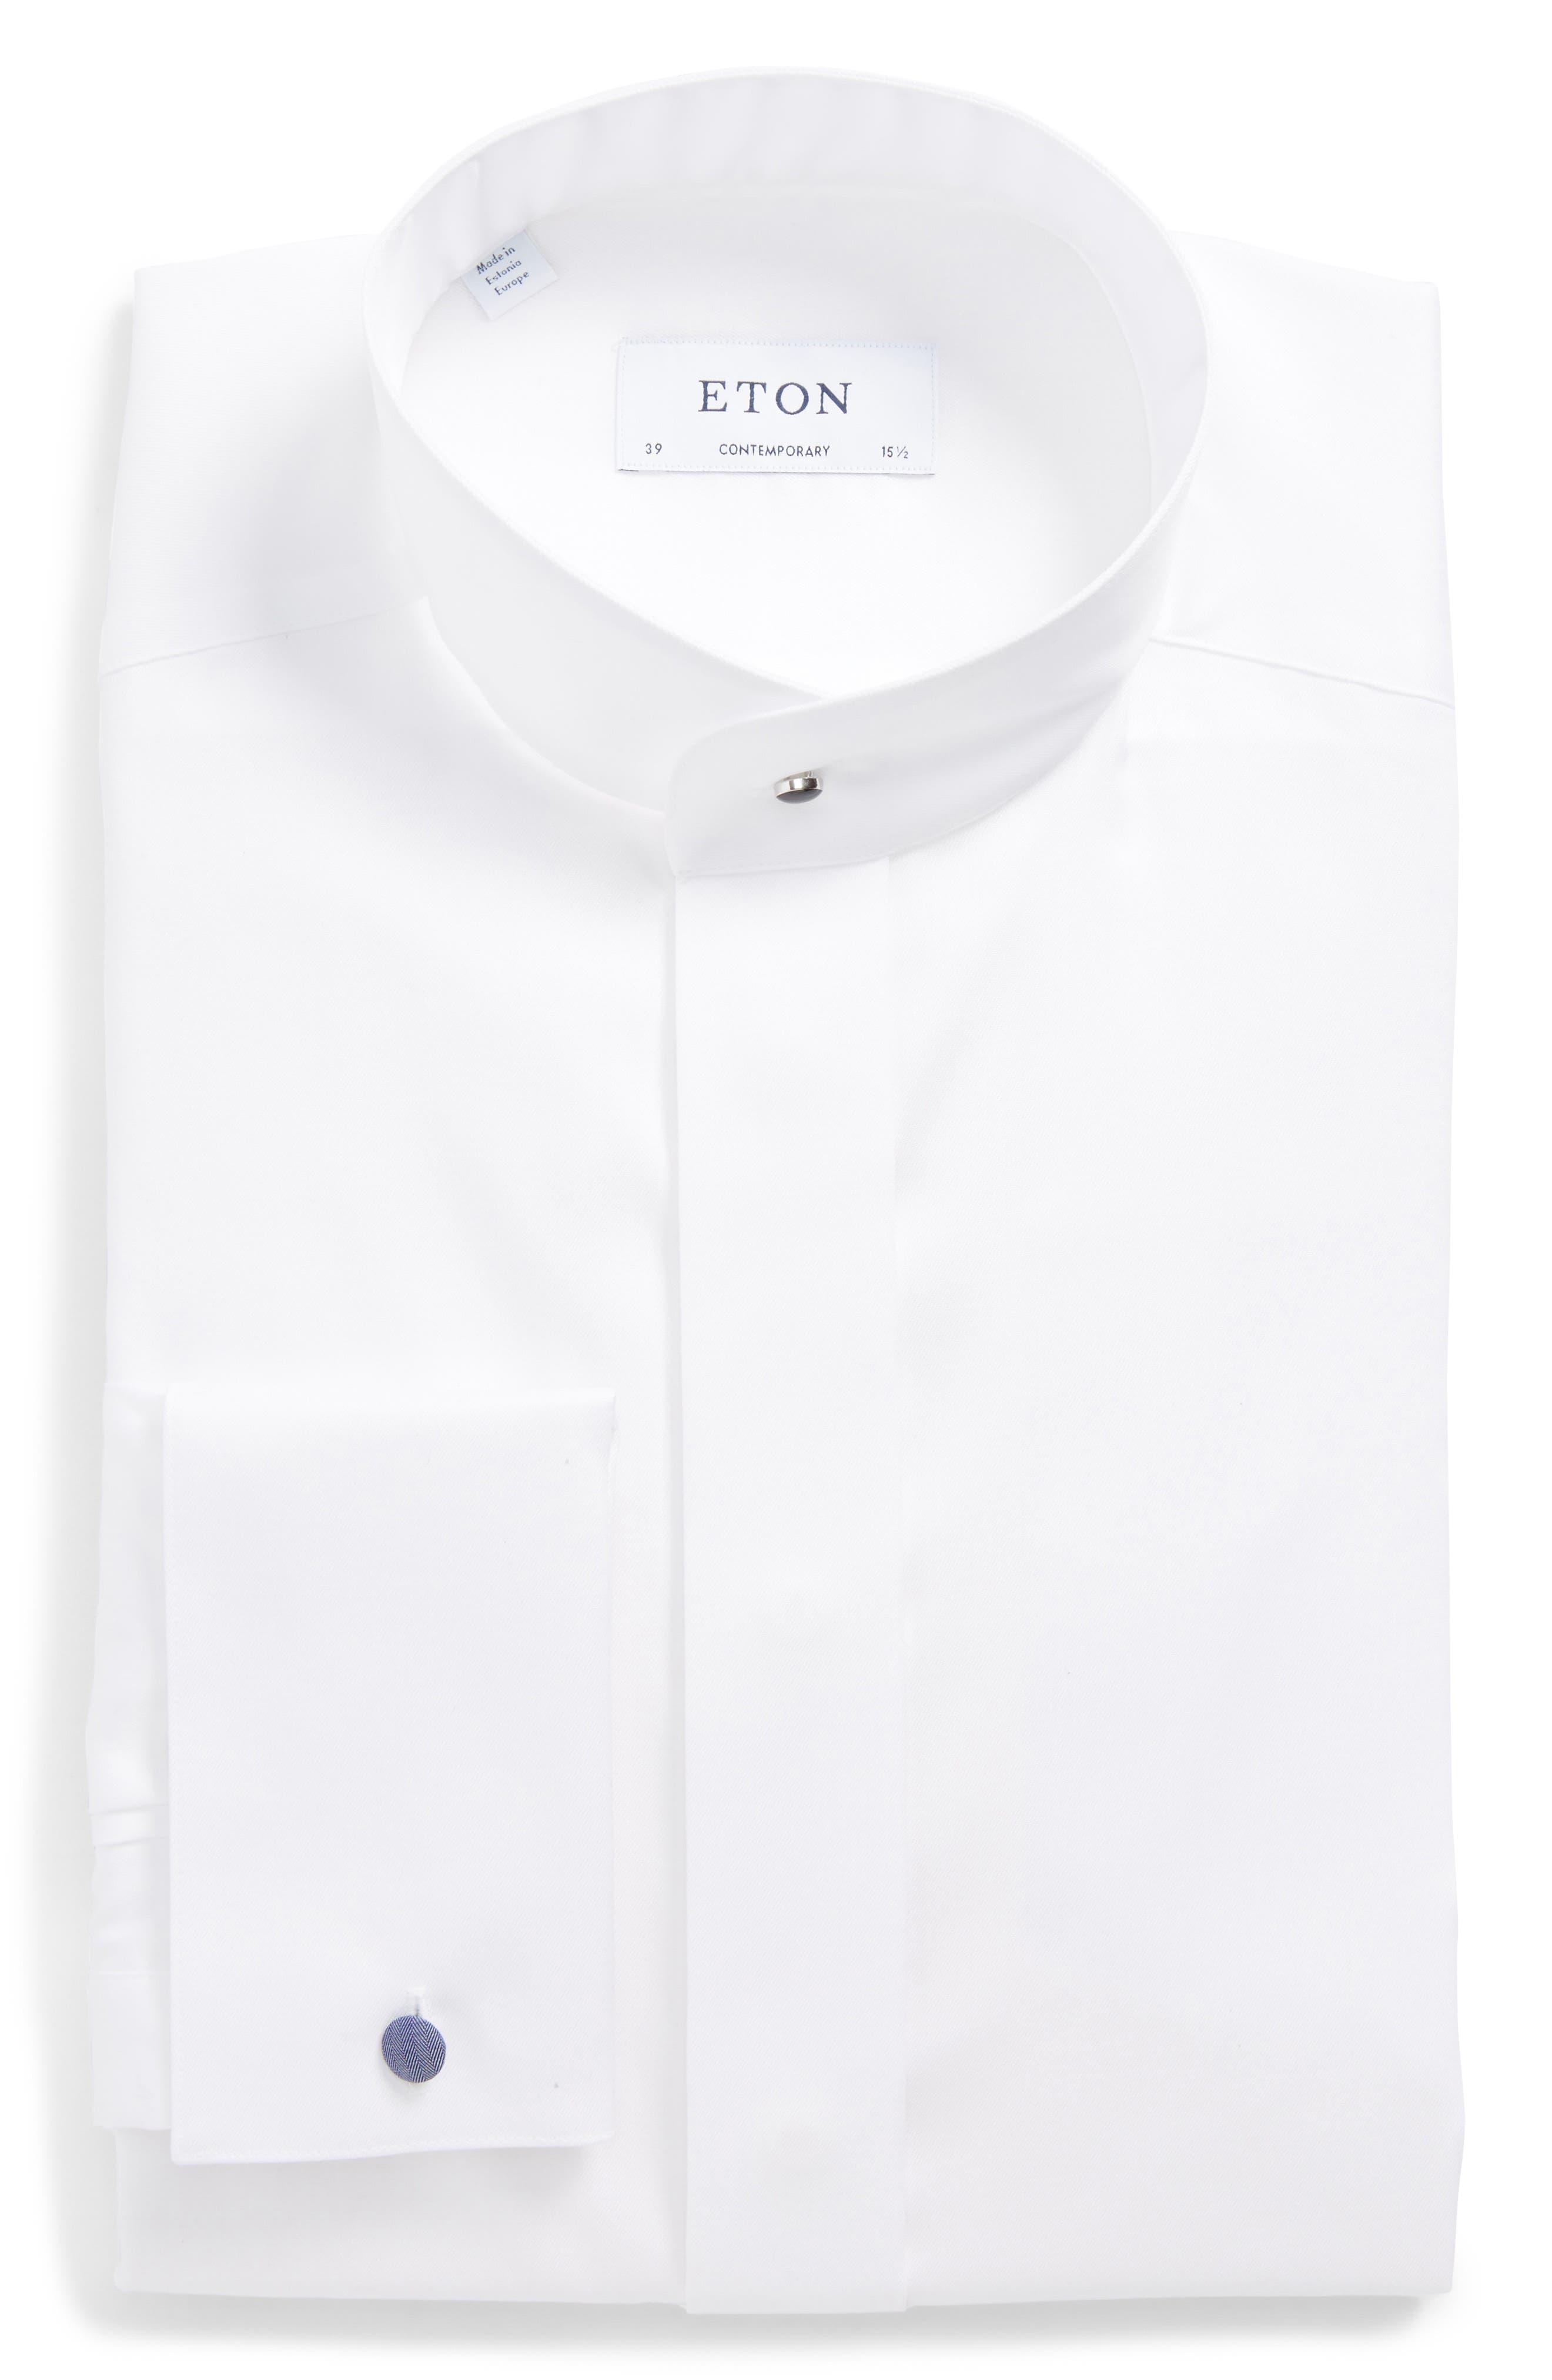 Eton Contemporary Fit Herringbone Tuxedo Shirt